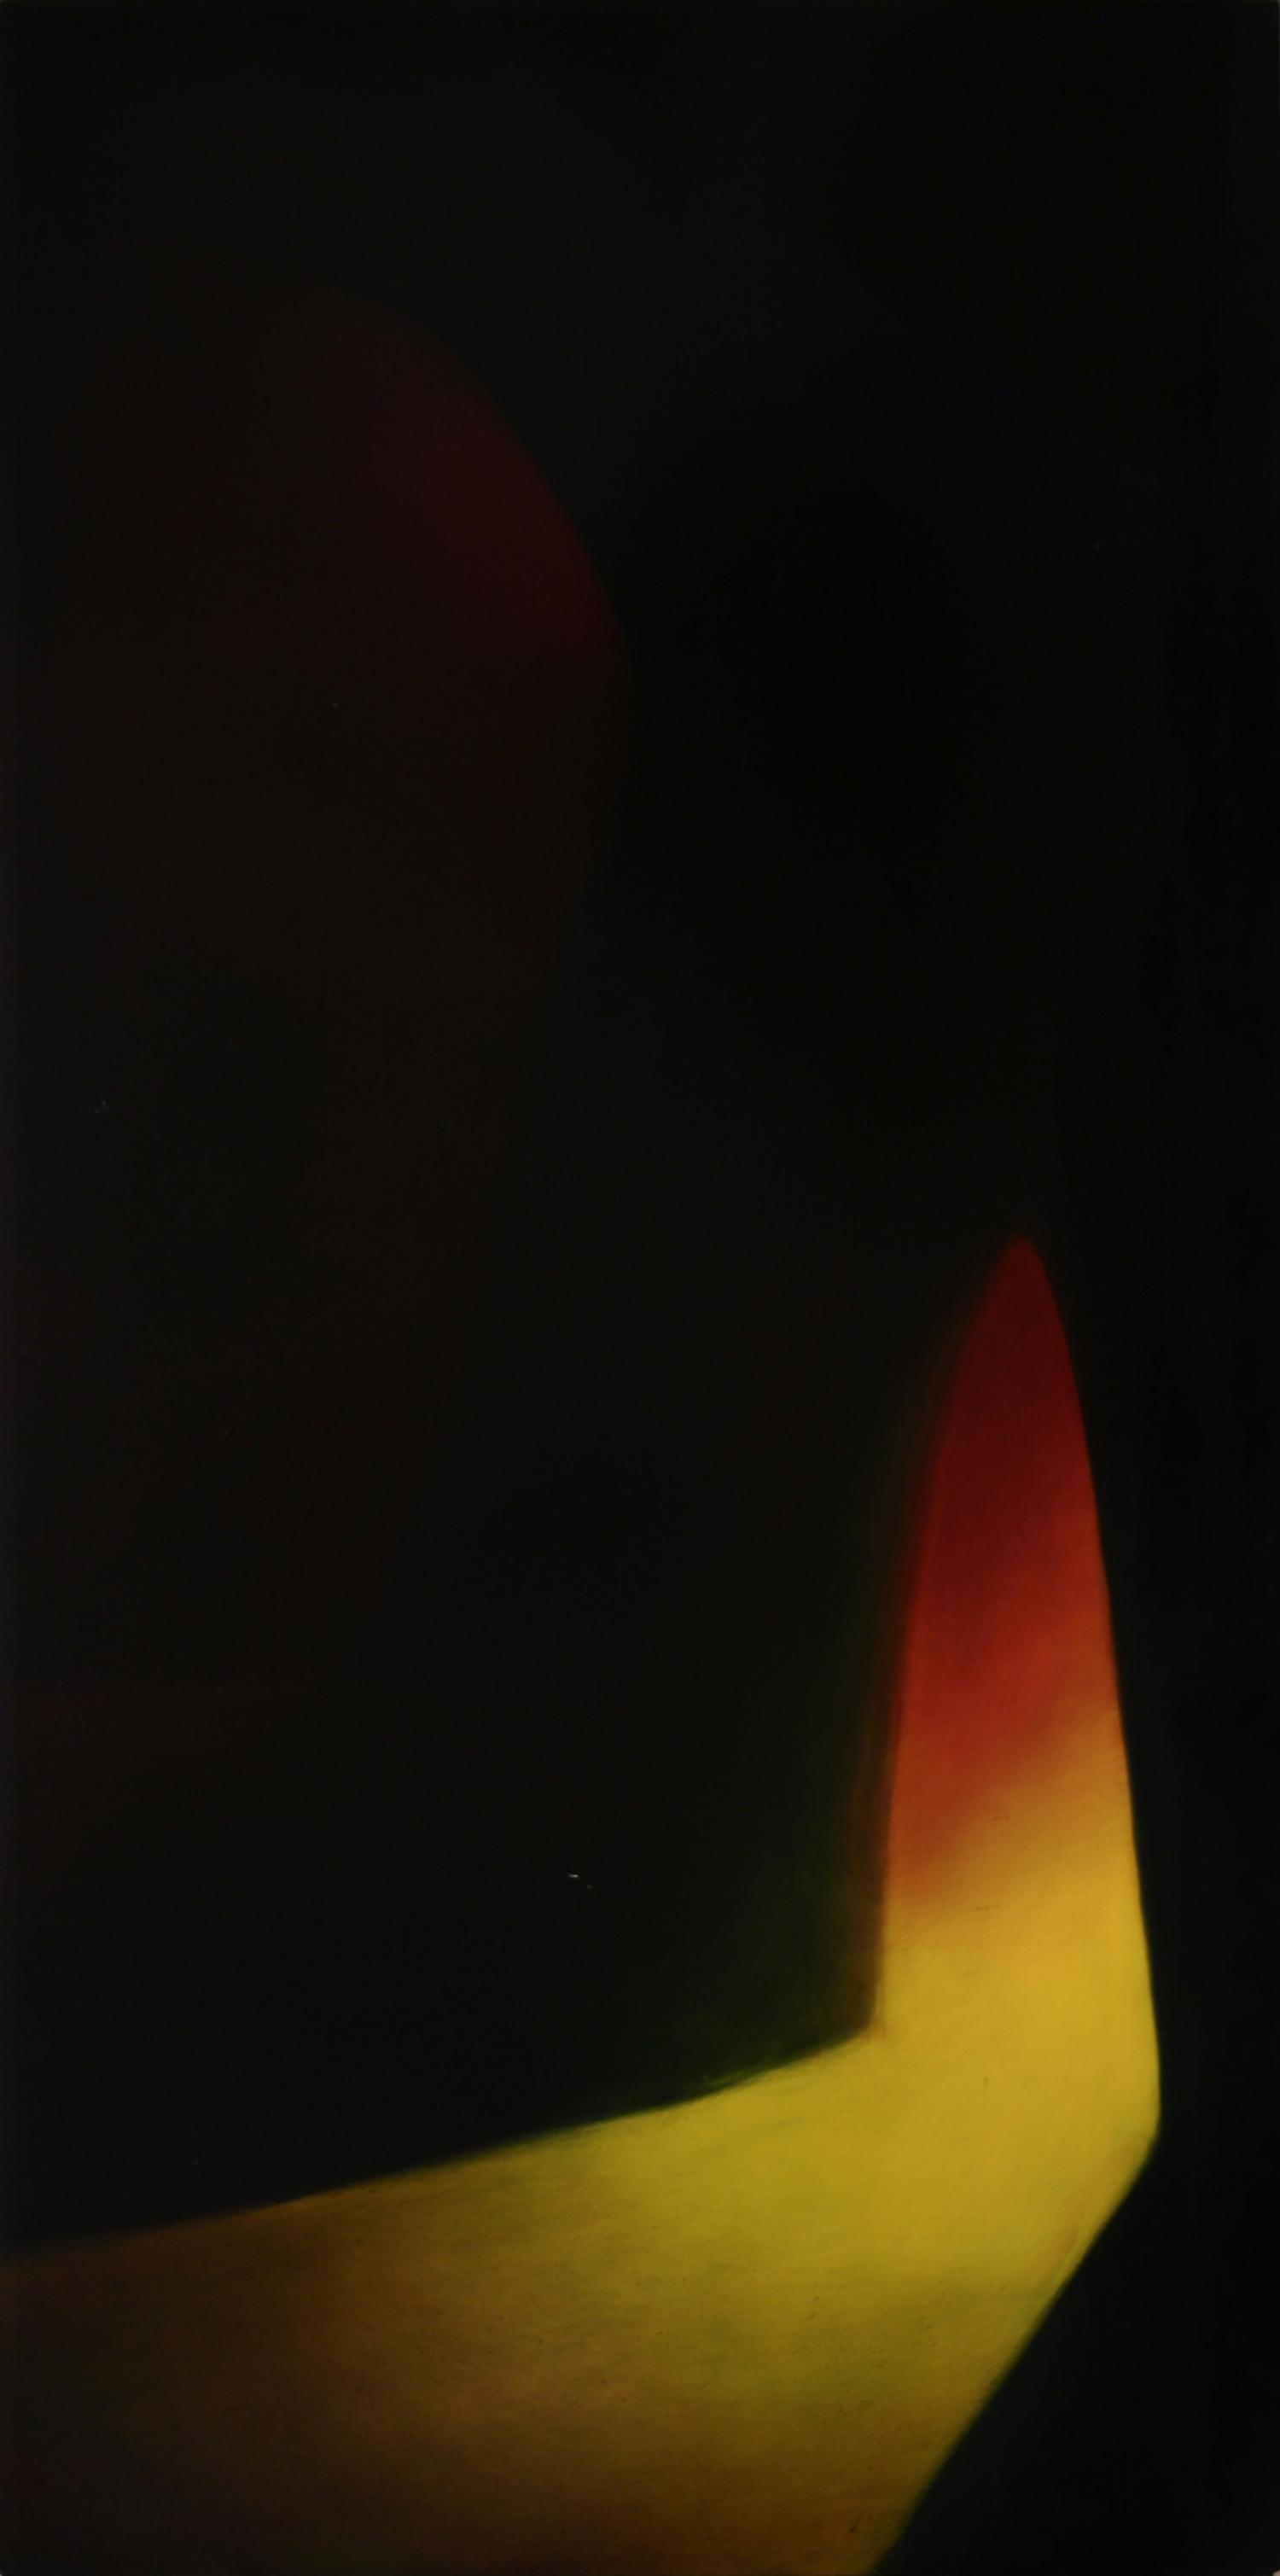 Threshold • 48 x 24 • Panel • 1800